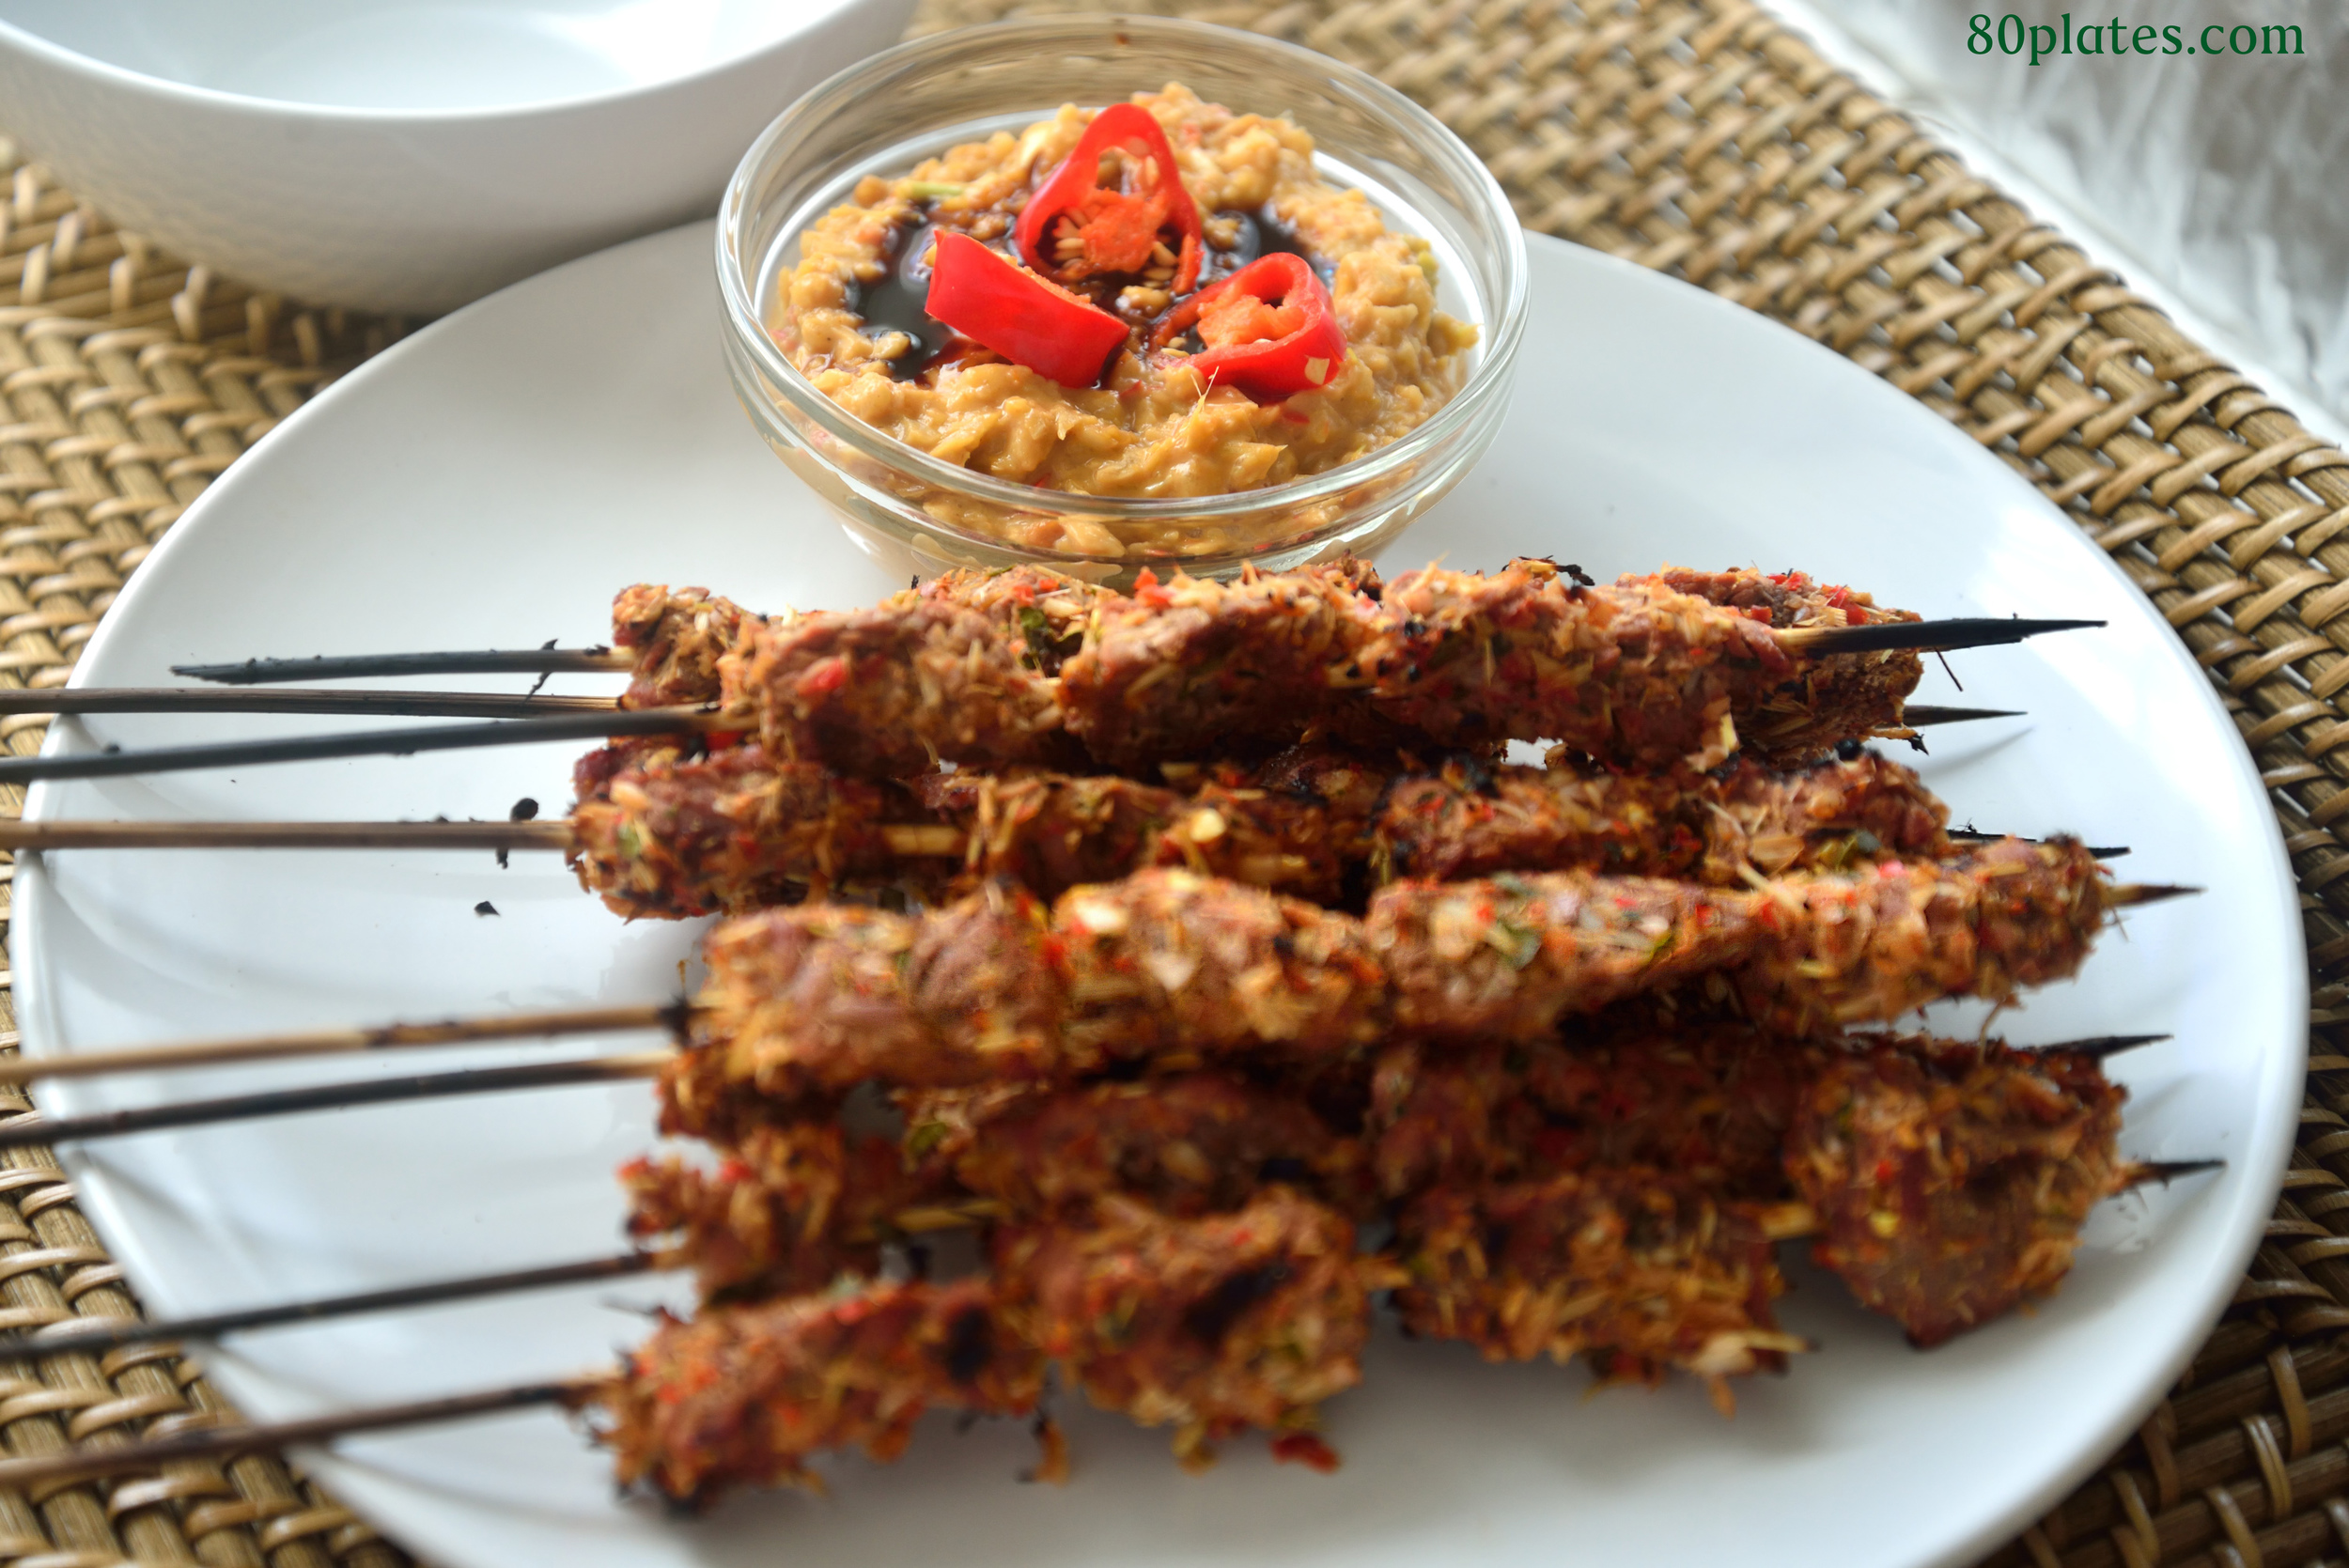 Indonesia - Beef Satay with Chili Peanut Sauce